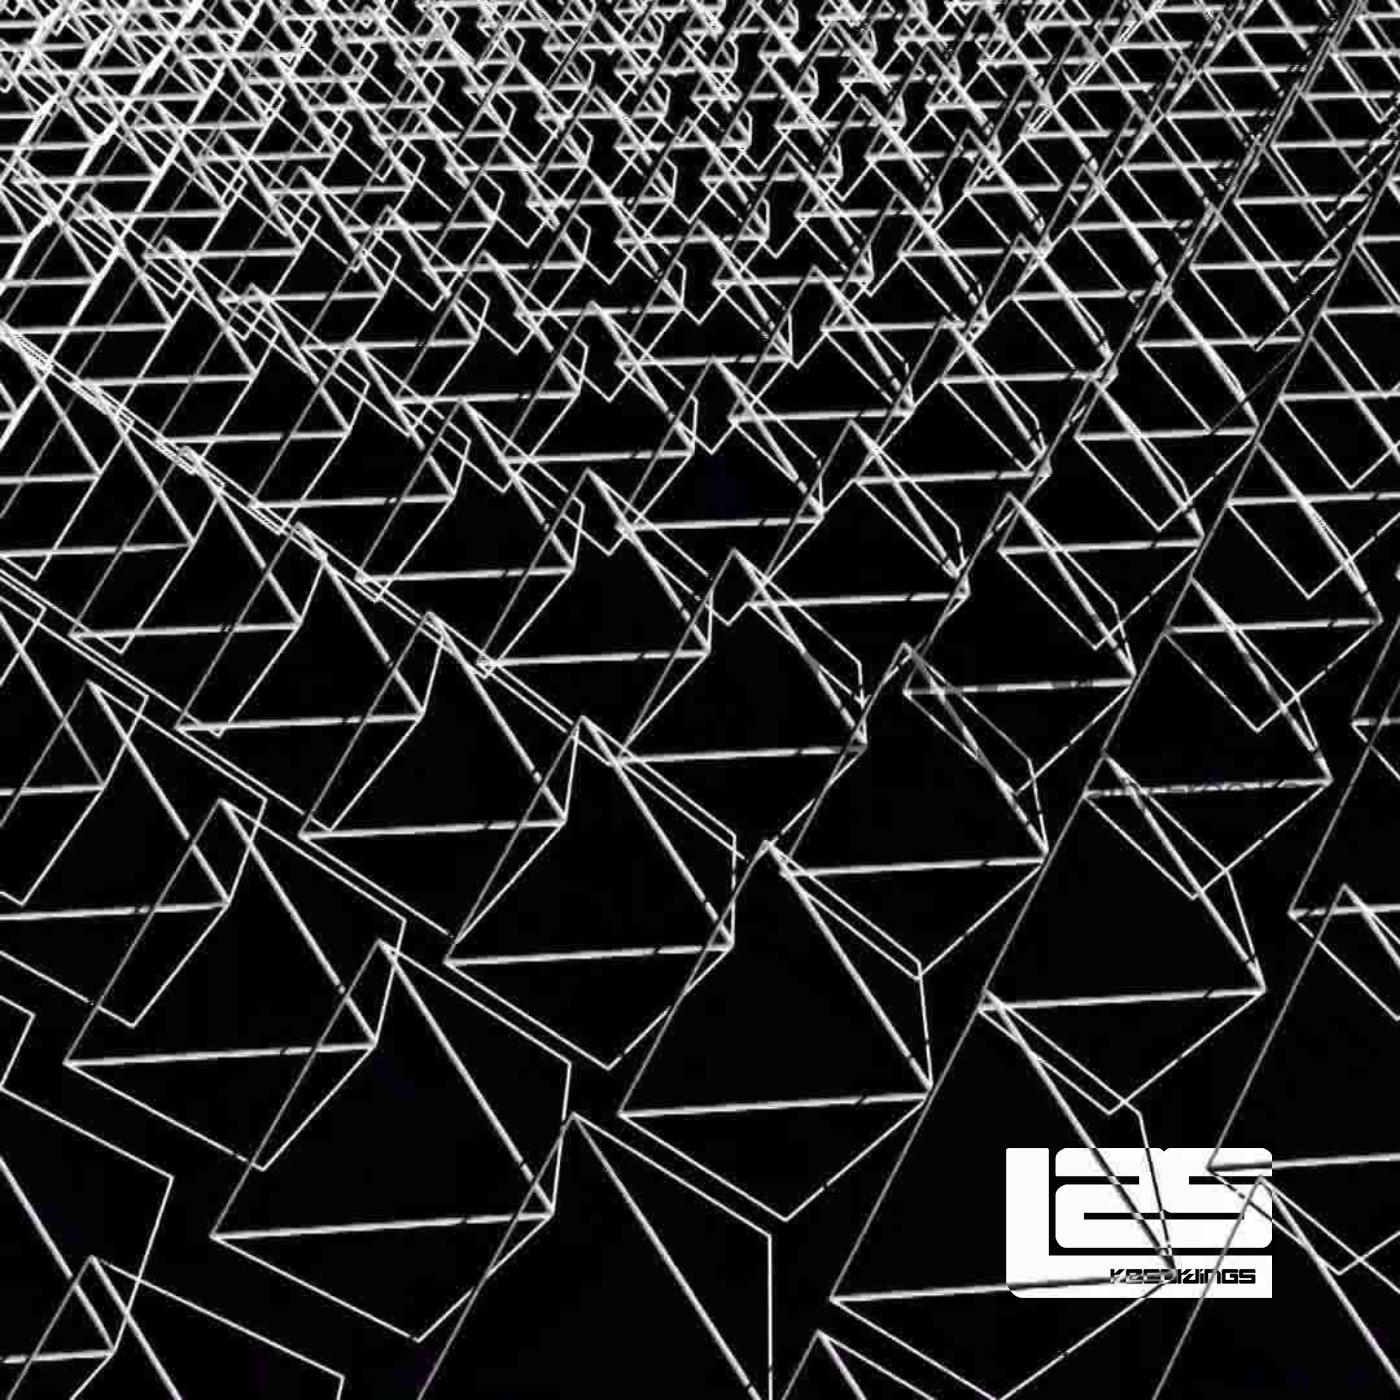 L2S117: Mokujin - Ruff Diamond EP